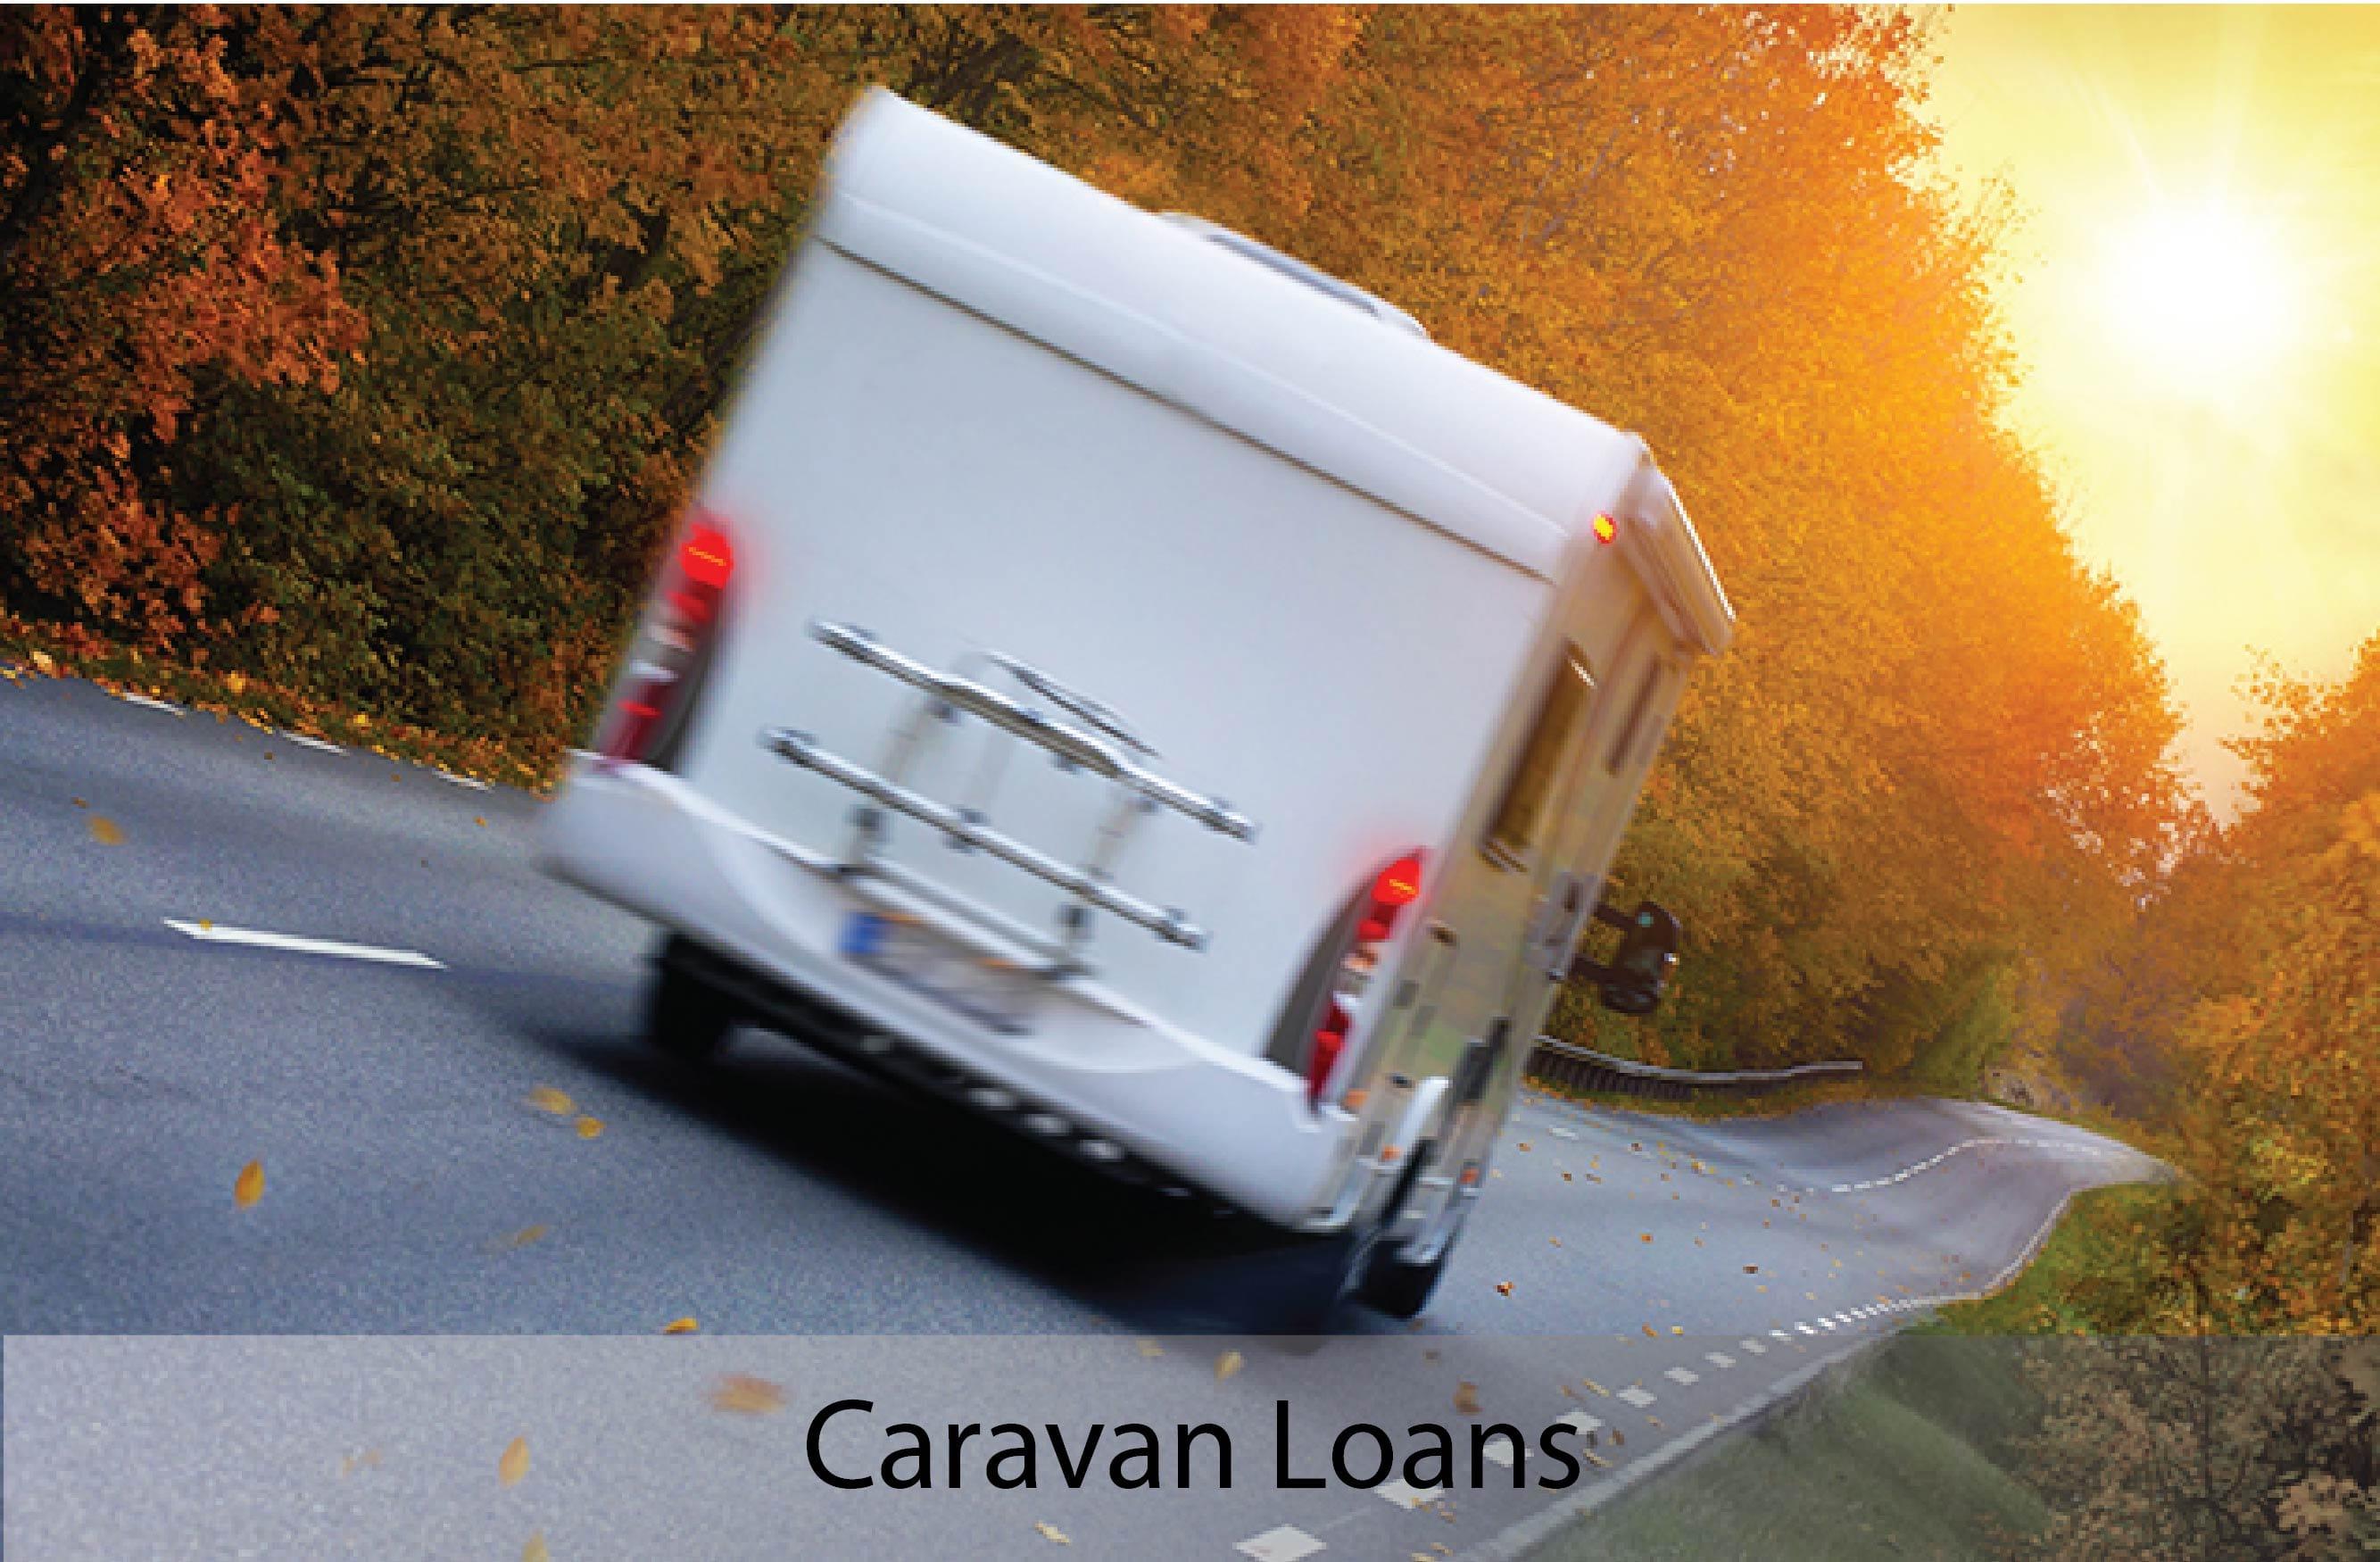 Caravan Loans